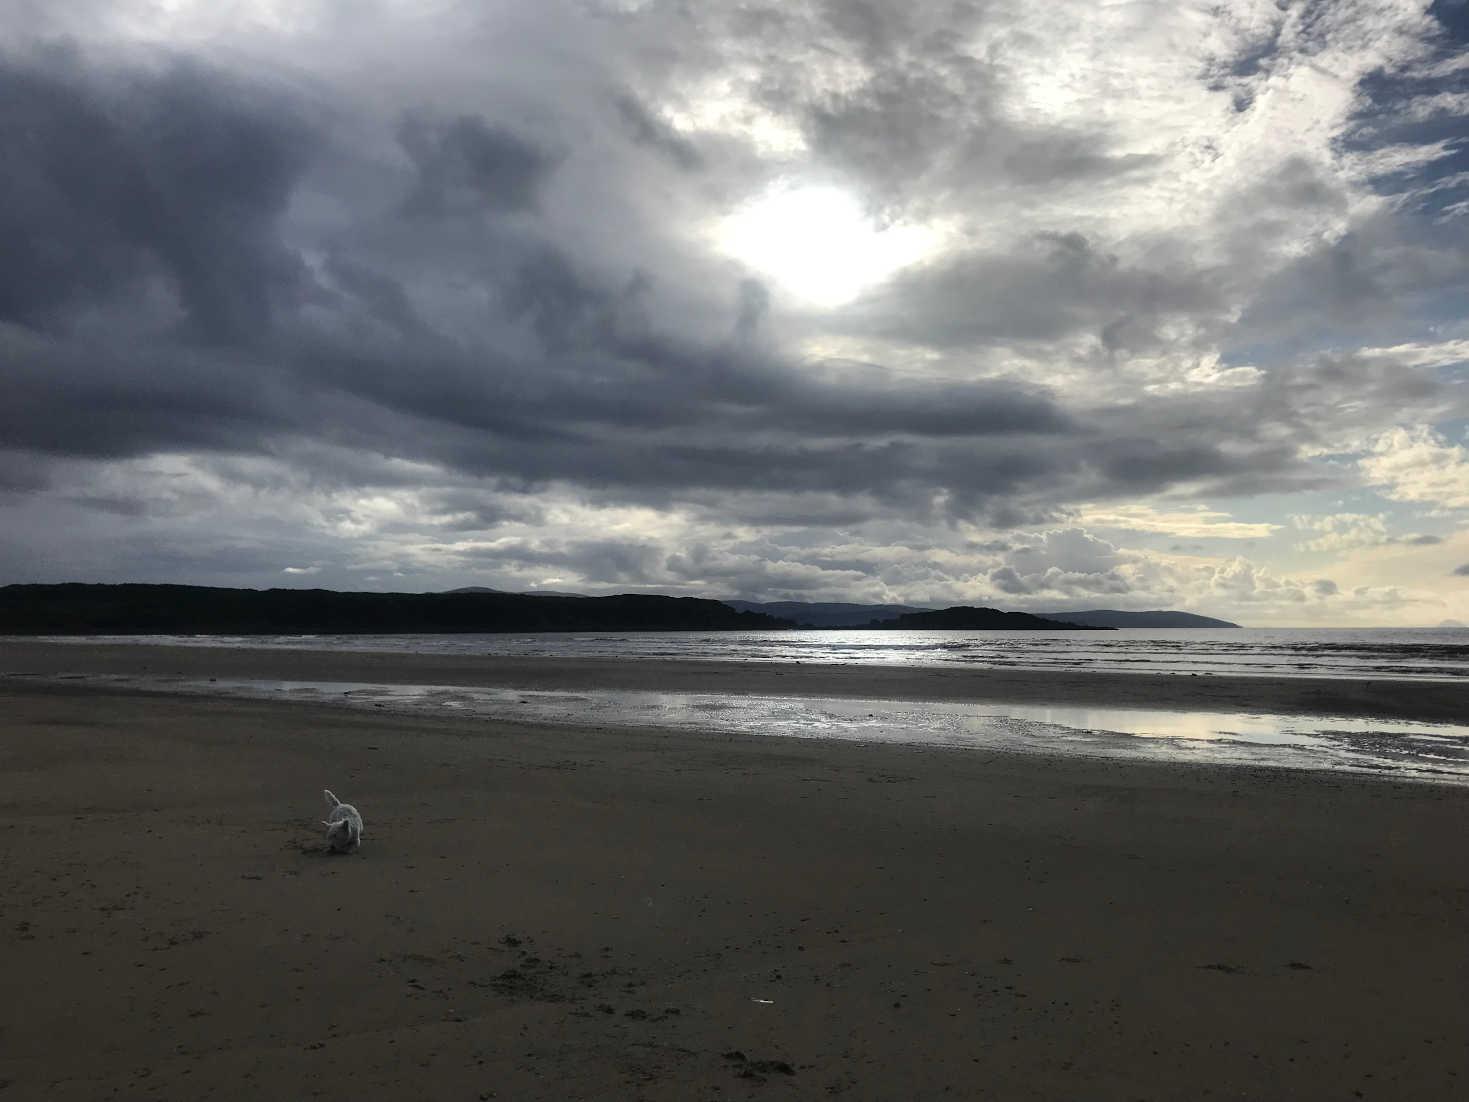 poppysocks on caradale beach in the morning